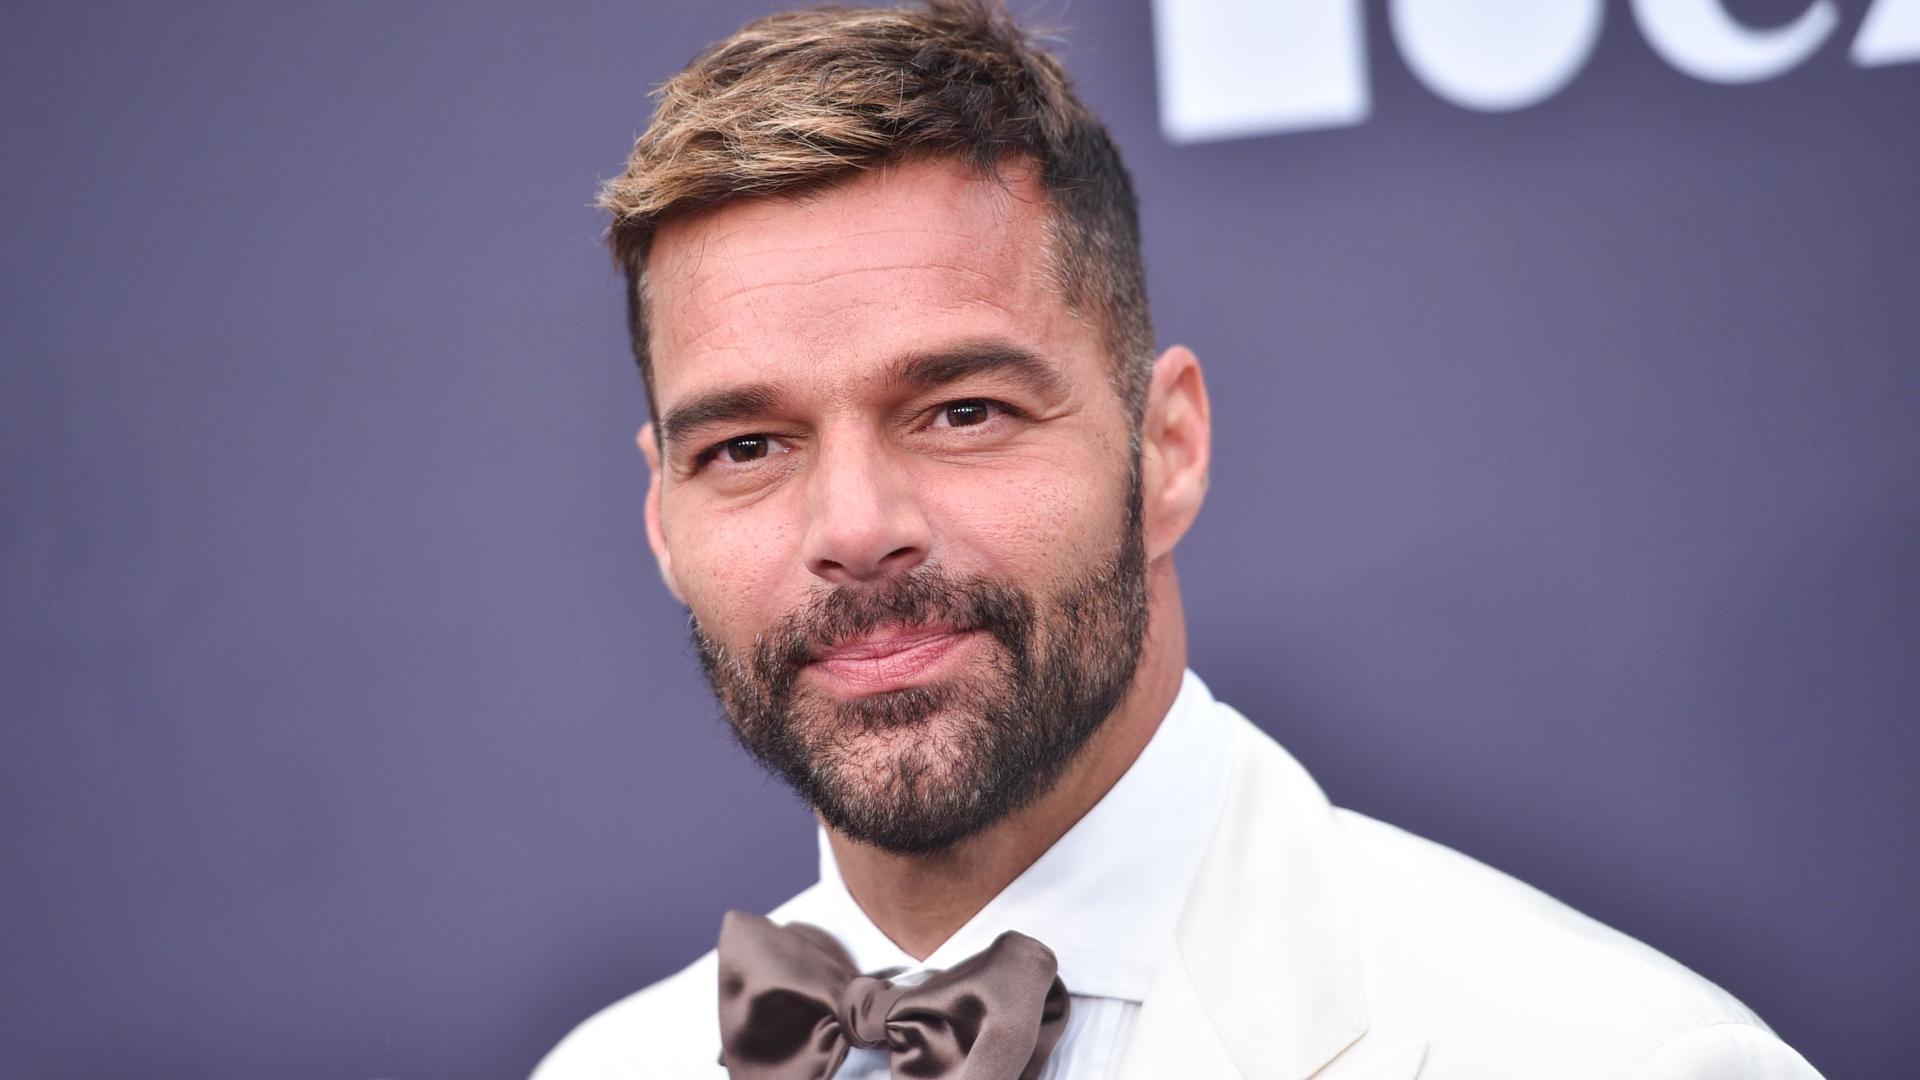 Ricky Martin faz teste à Covid-19 antes dos Latin Grammy Awards